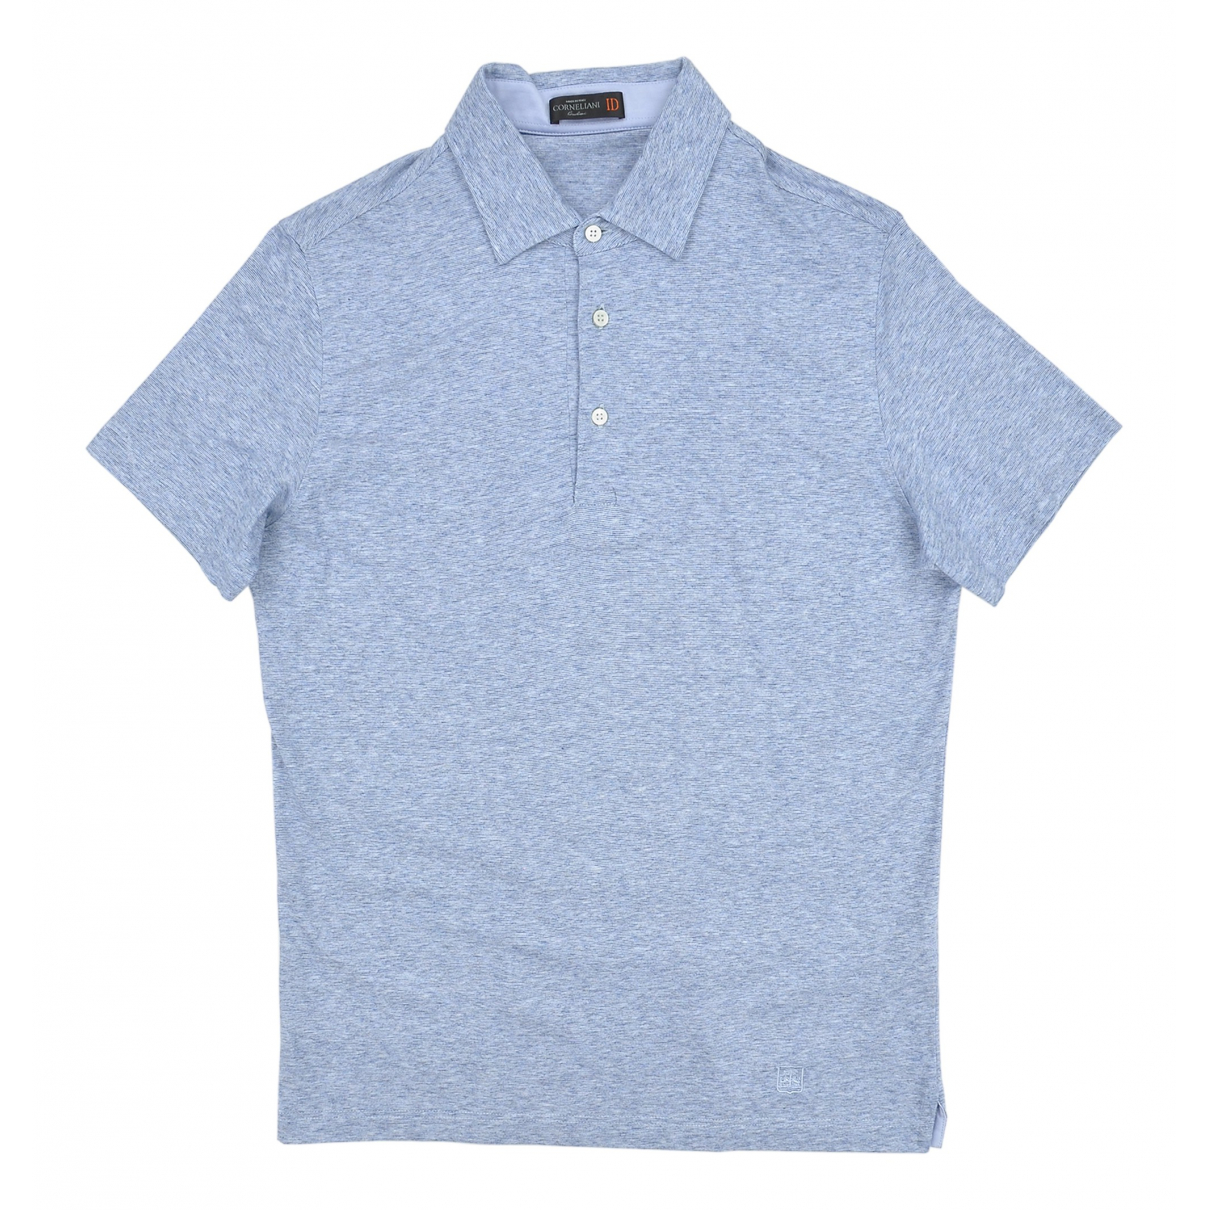 Corneliani - Polos   pour homme en coton - bleu